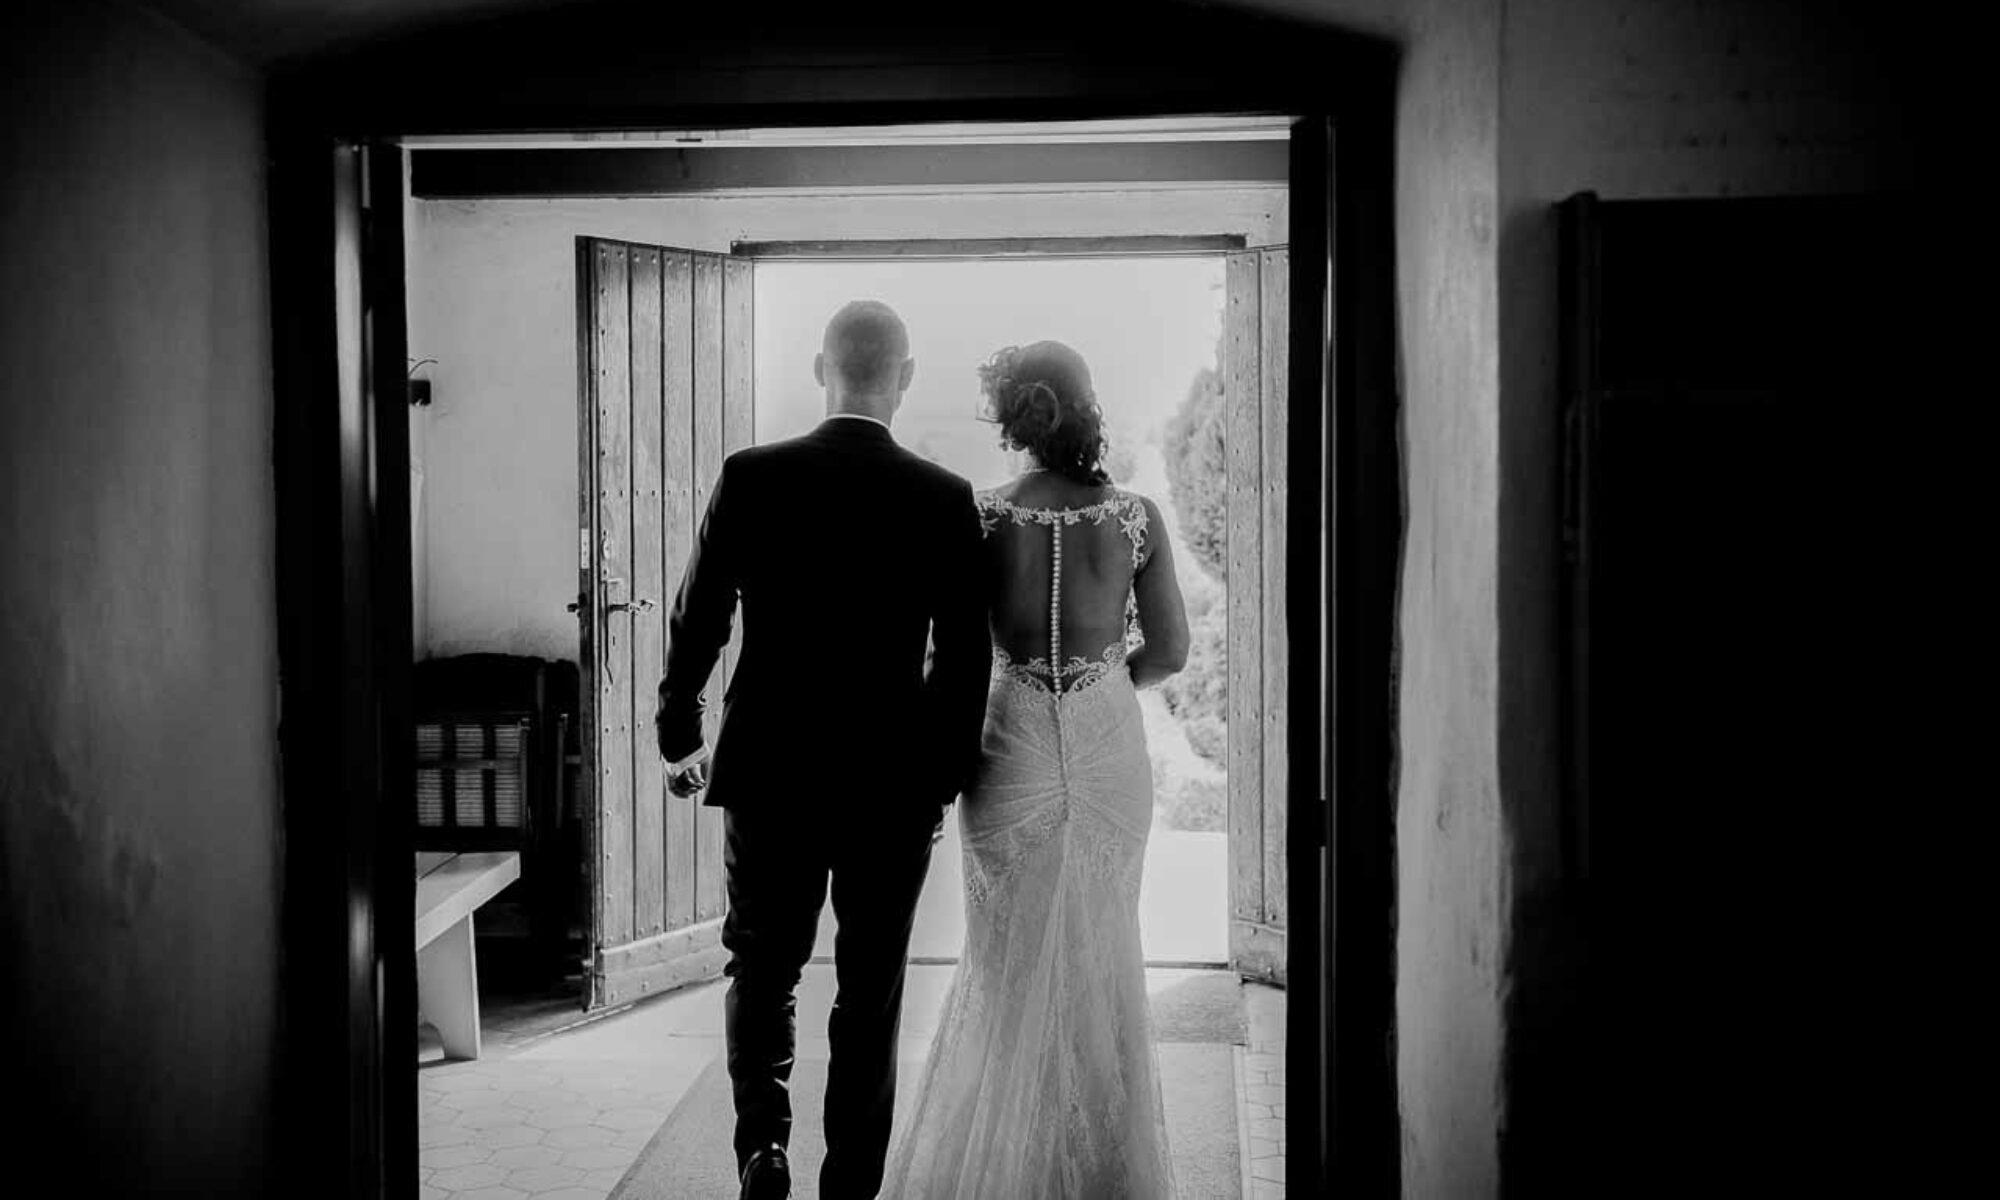 Bryllup Zonen - Alt om bryllup